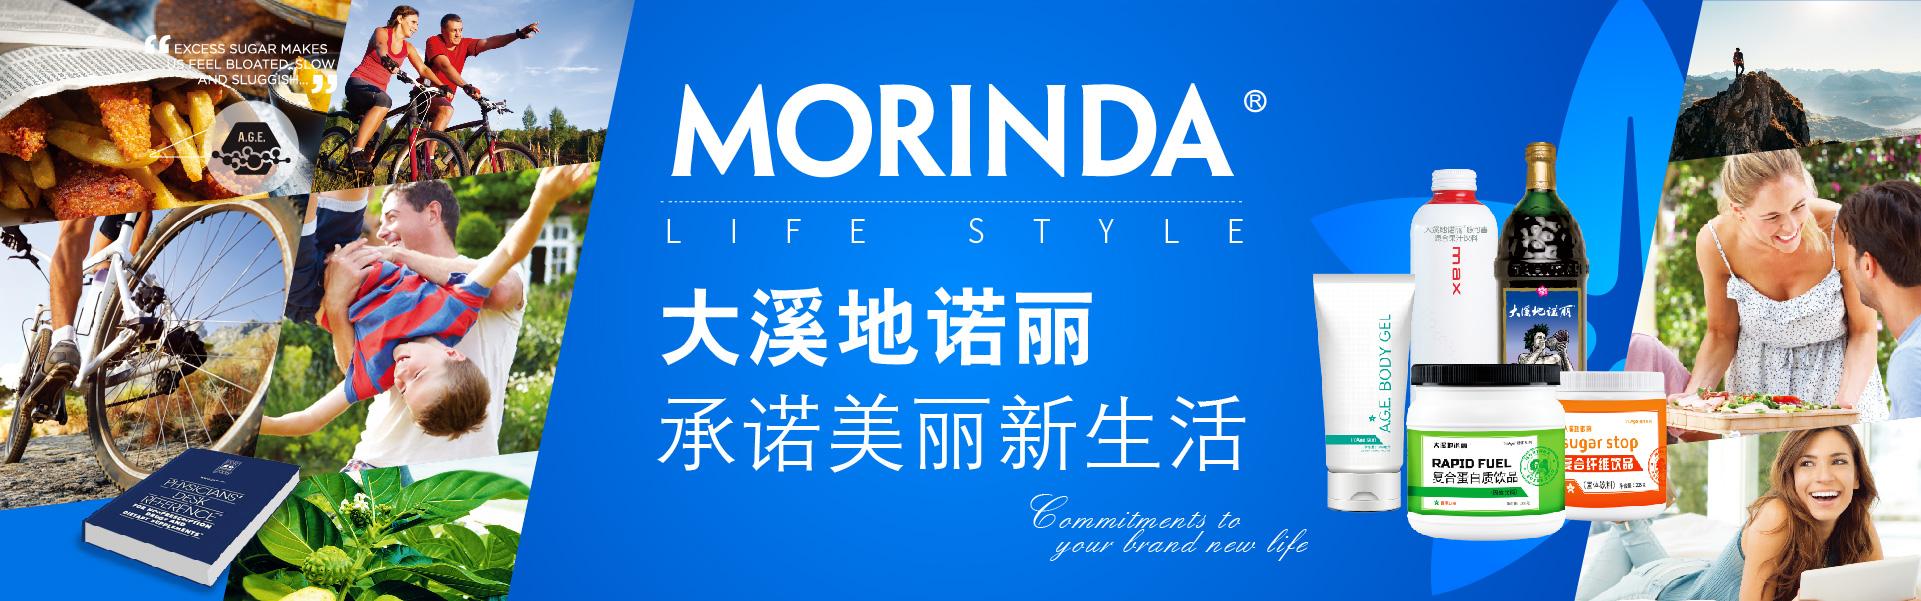 Image of Morinda warehouse